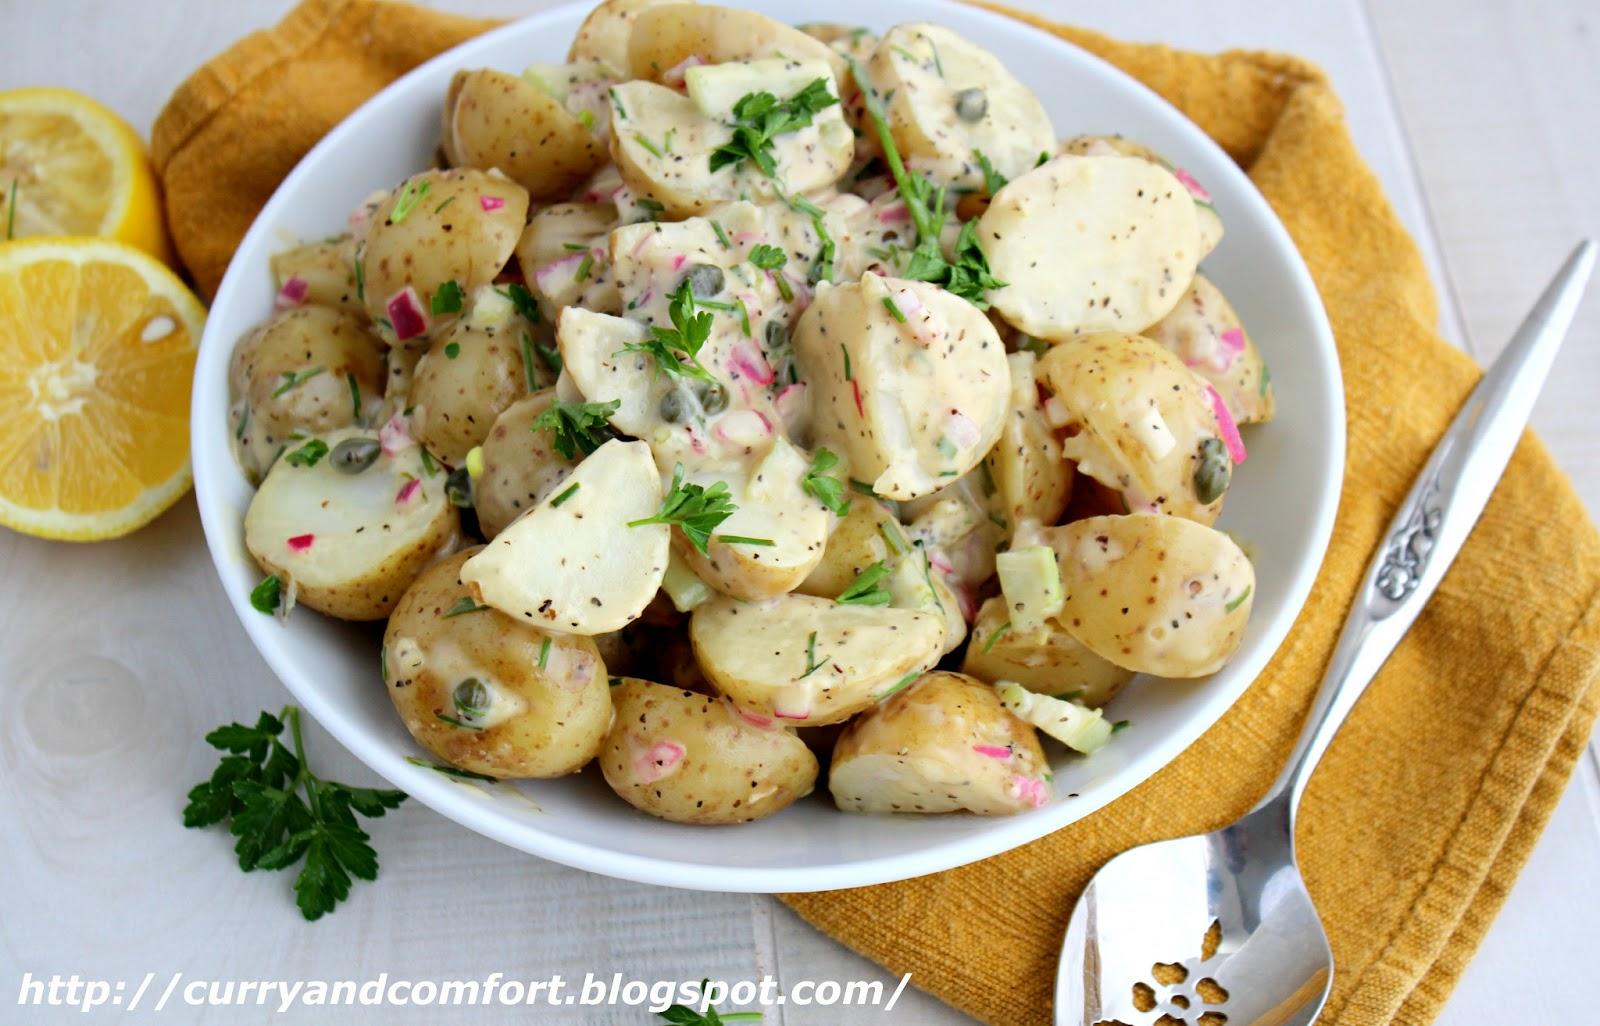 Potato Salad Recipe With Chives